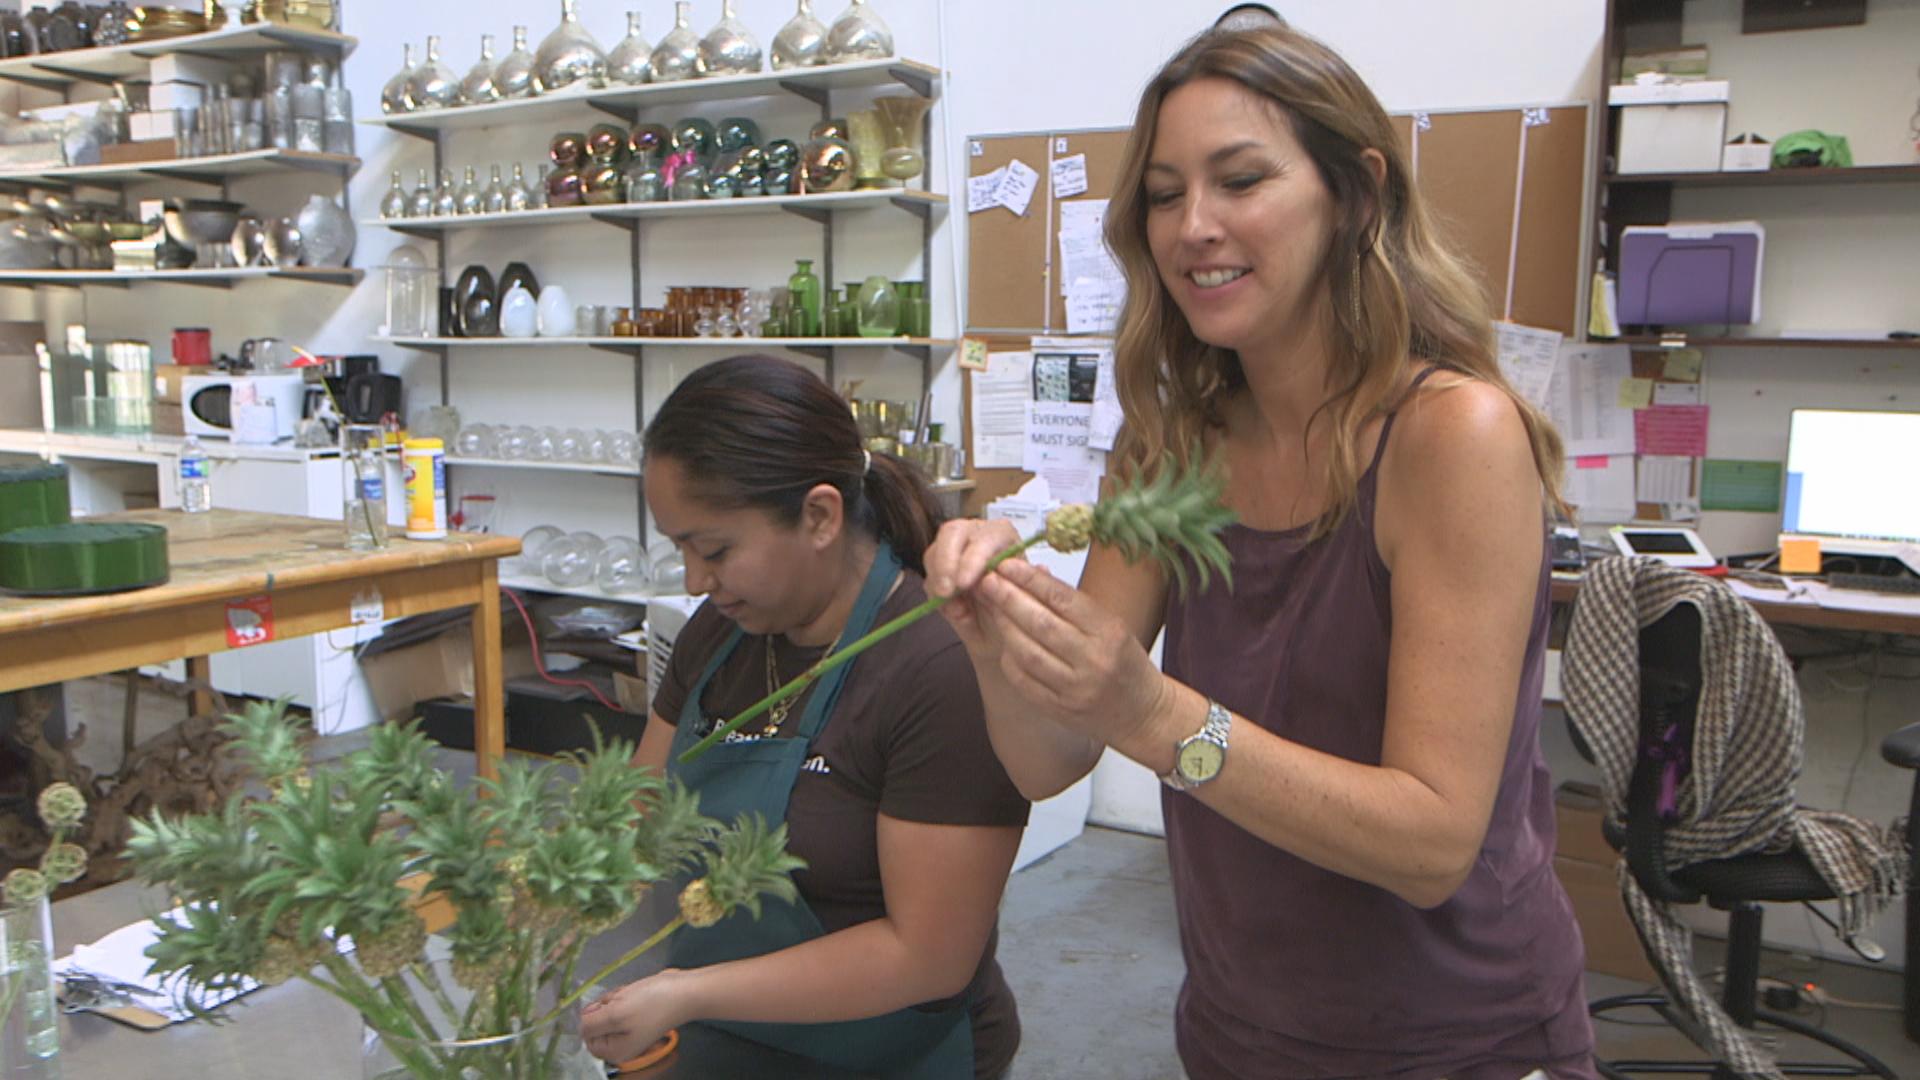 Floral Art founder Jennifer McGarigle, Balancing Creativity and Business